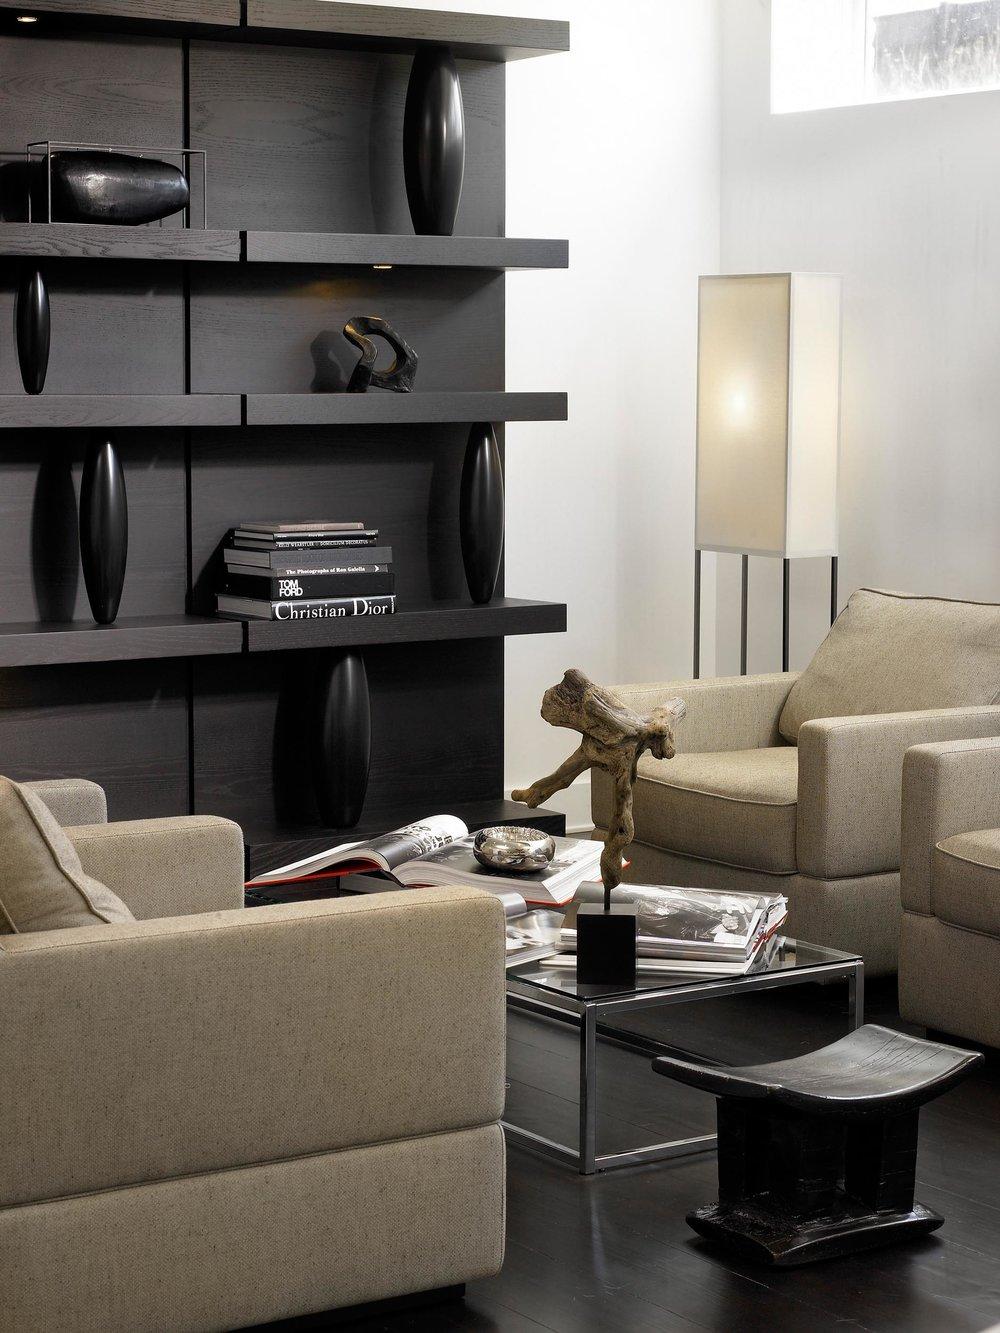 Leo_Designs_Chicago_interior_design_contemporary_inspired_nail_factory_conversion6.jpg